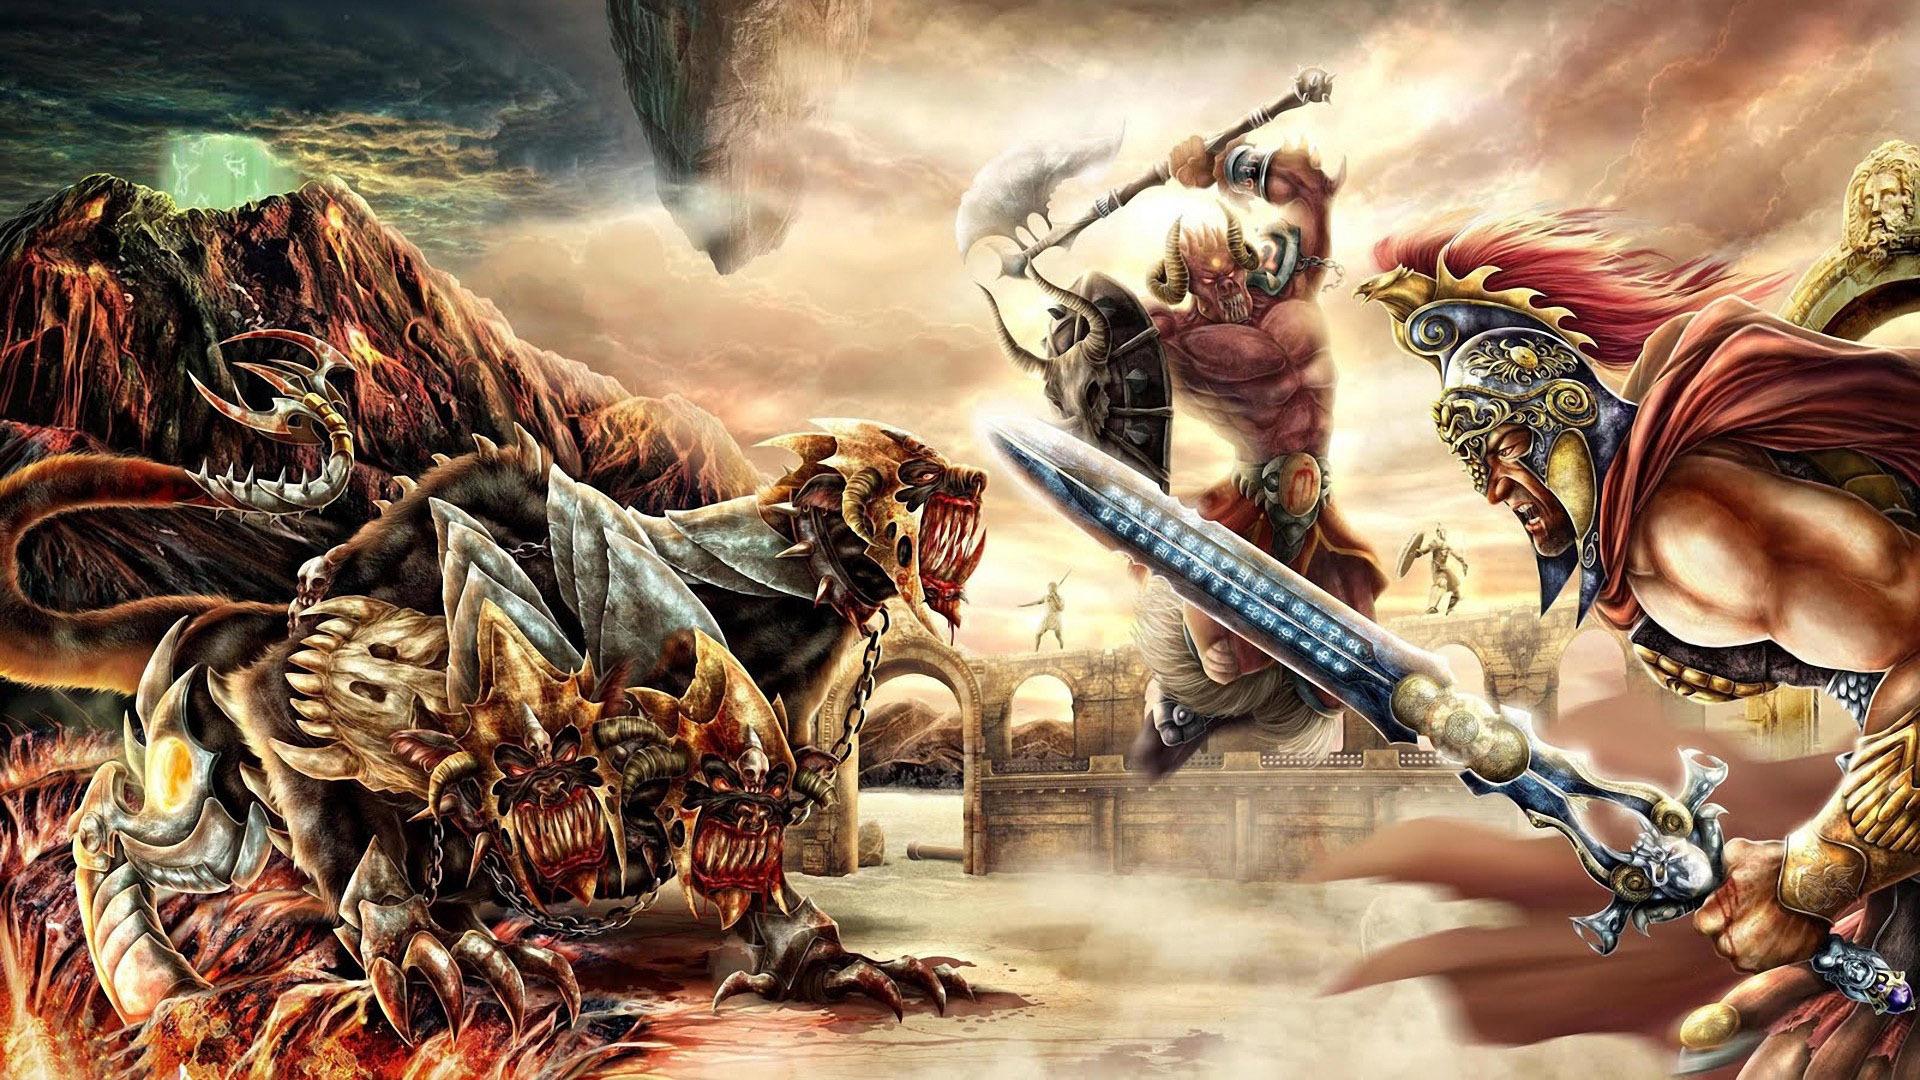 Free Download Final Battle Hd Wallpaper 1920x1080 1920x1080